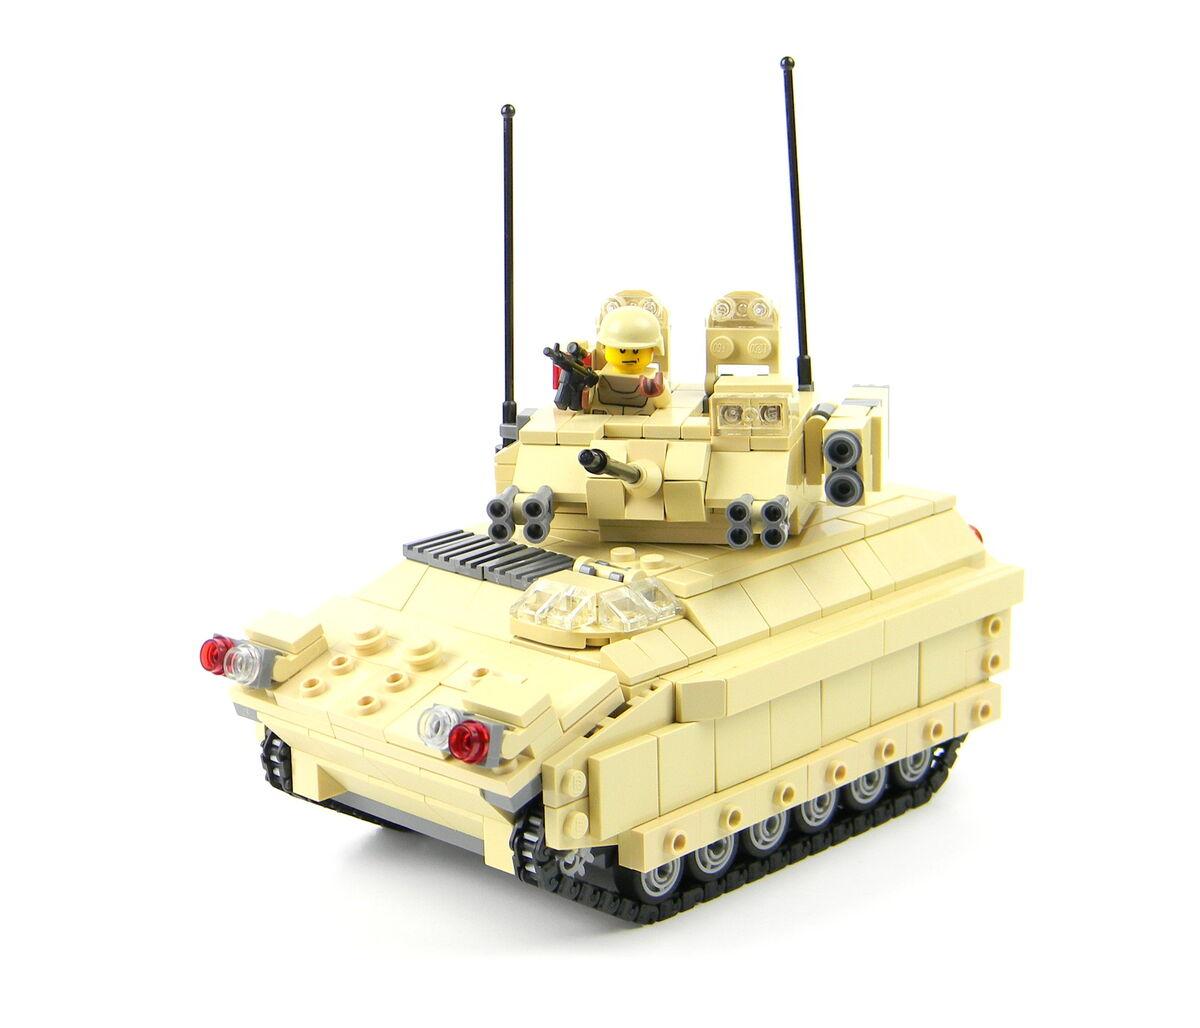 Custom LEGO army tank Bradley fighting vehicle main battle tankLego Army Tank